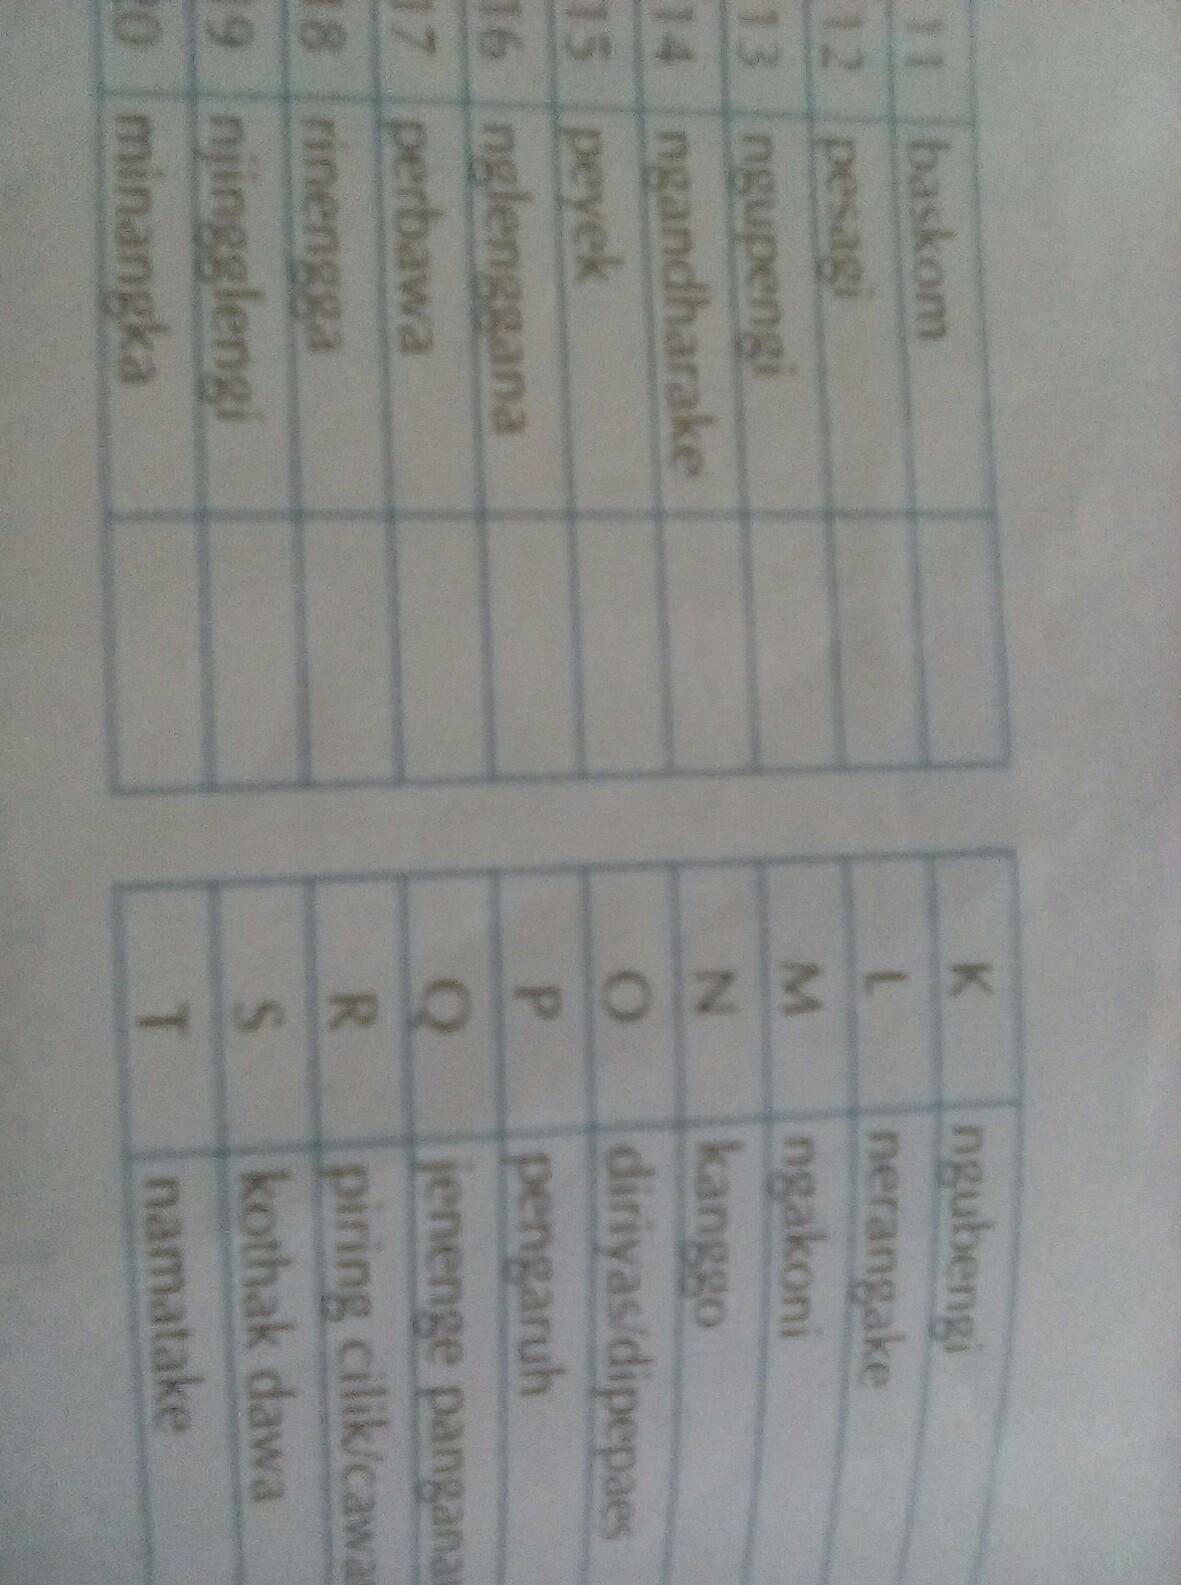 Soal Bhs Jawa Kelas 7 Kurikulum 2013 Brainly Co Id